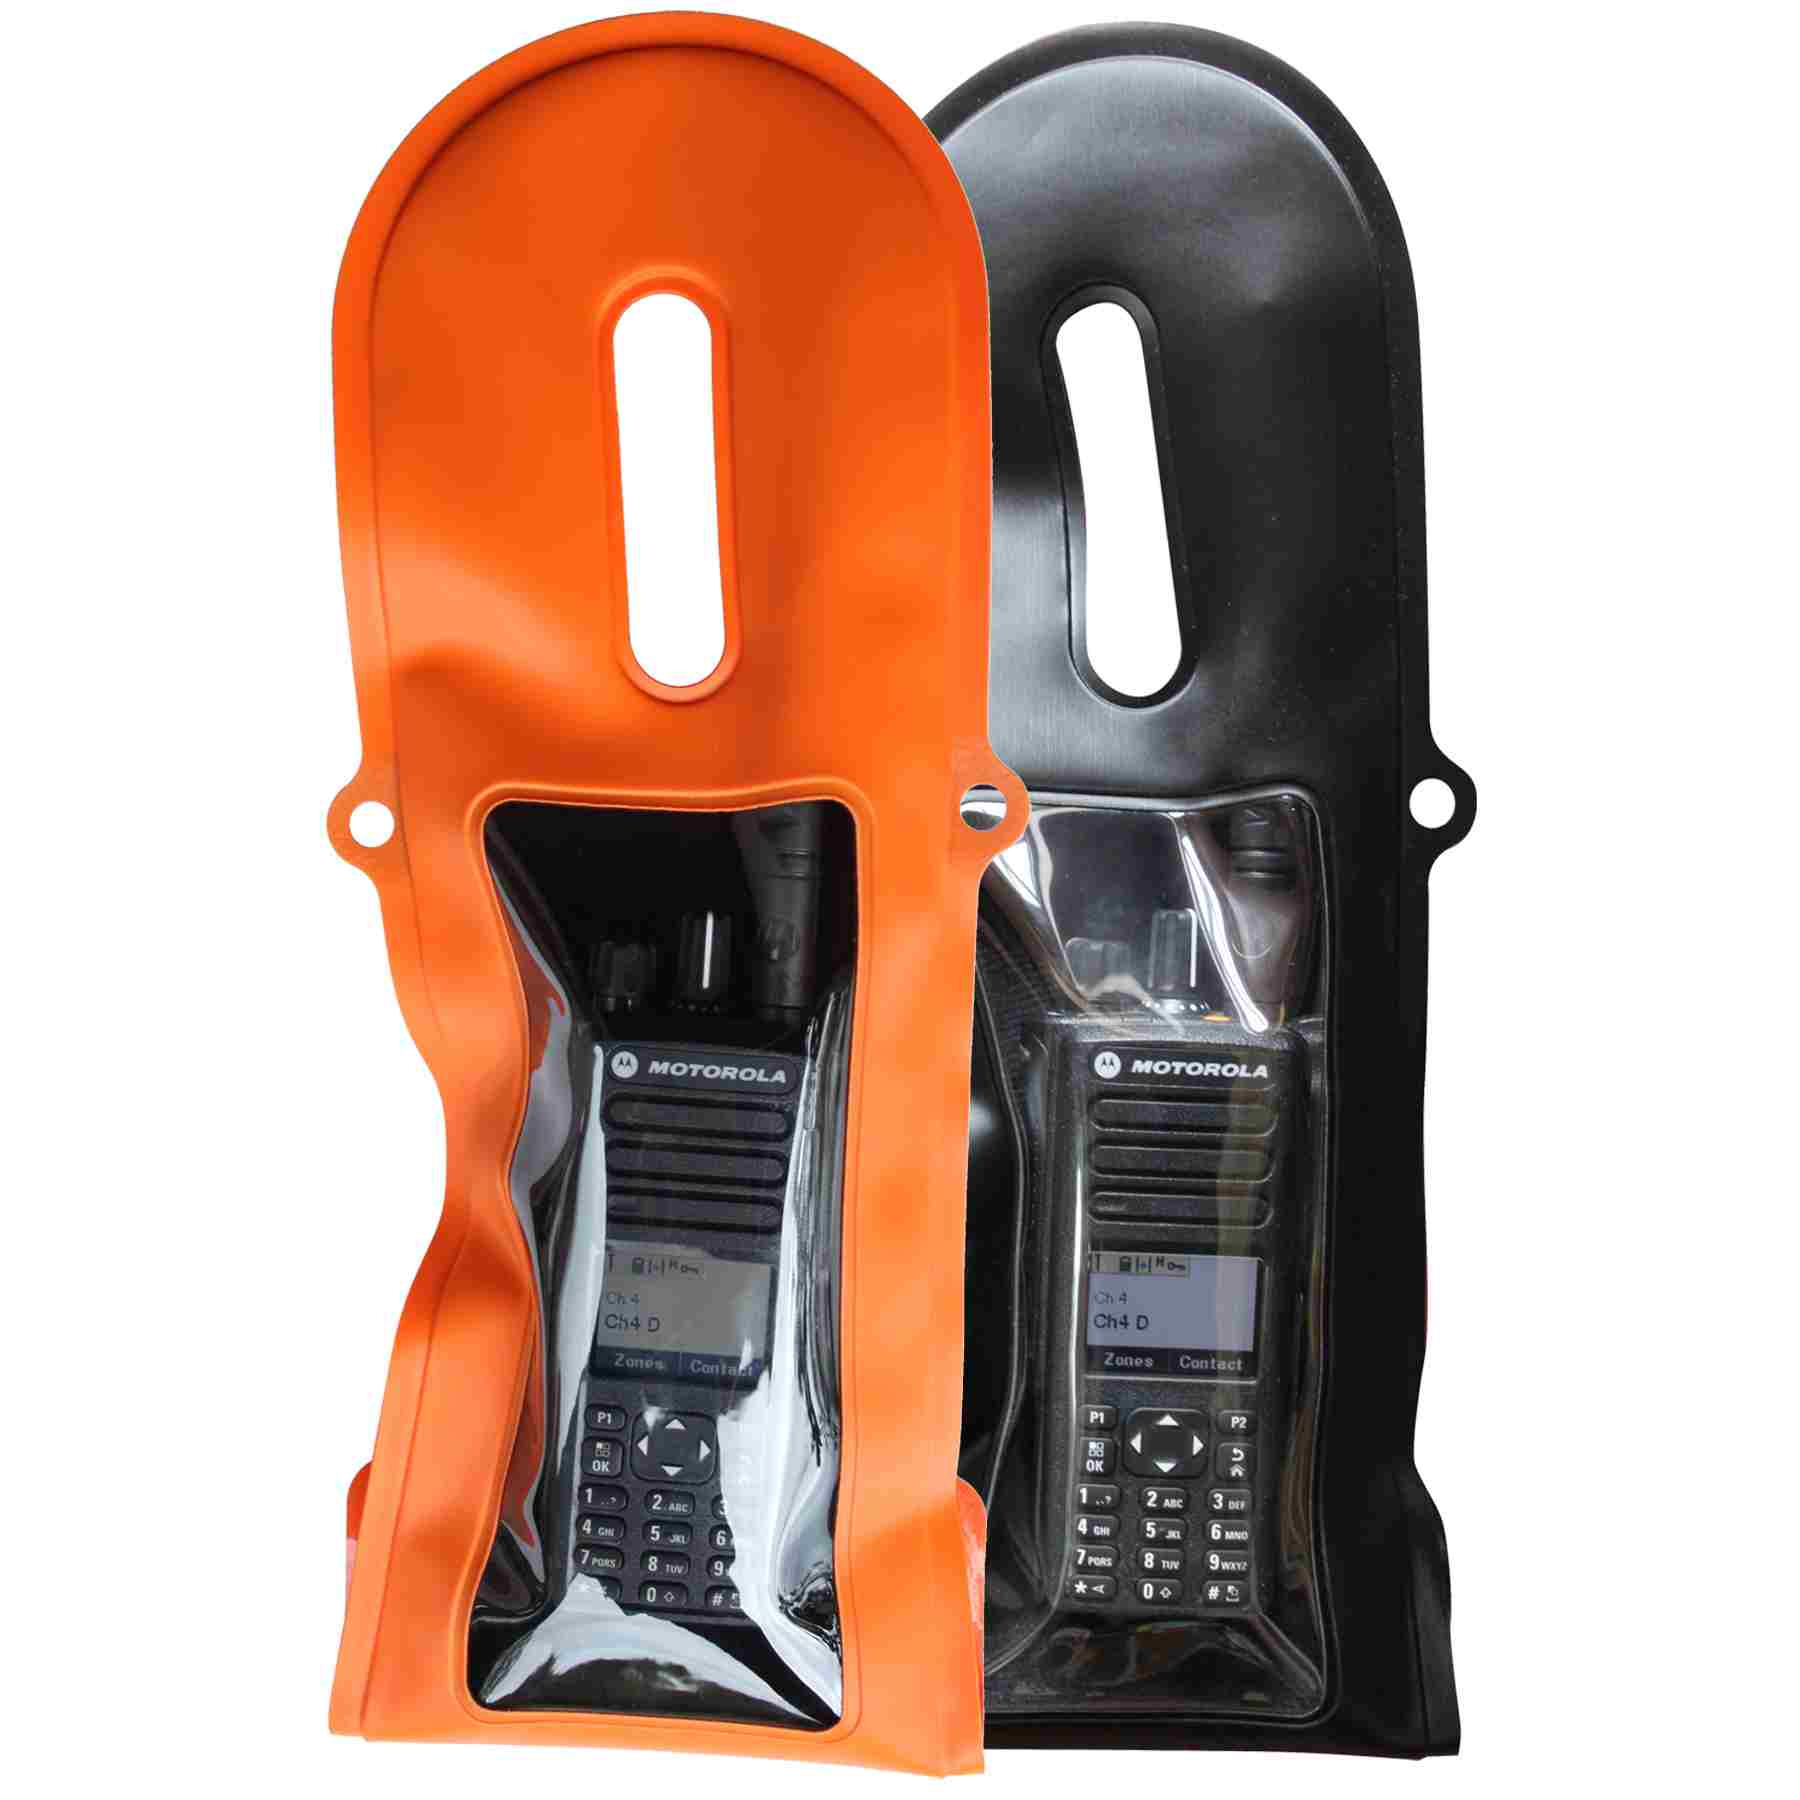 NEW! Trail proofSmall VHF PRO waterproof